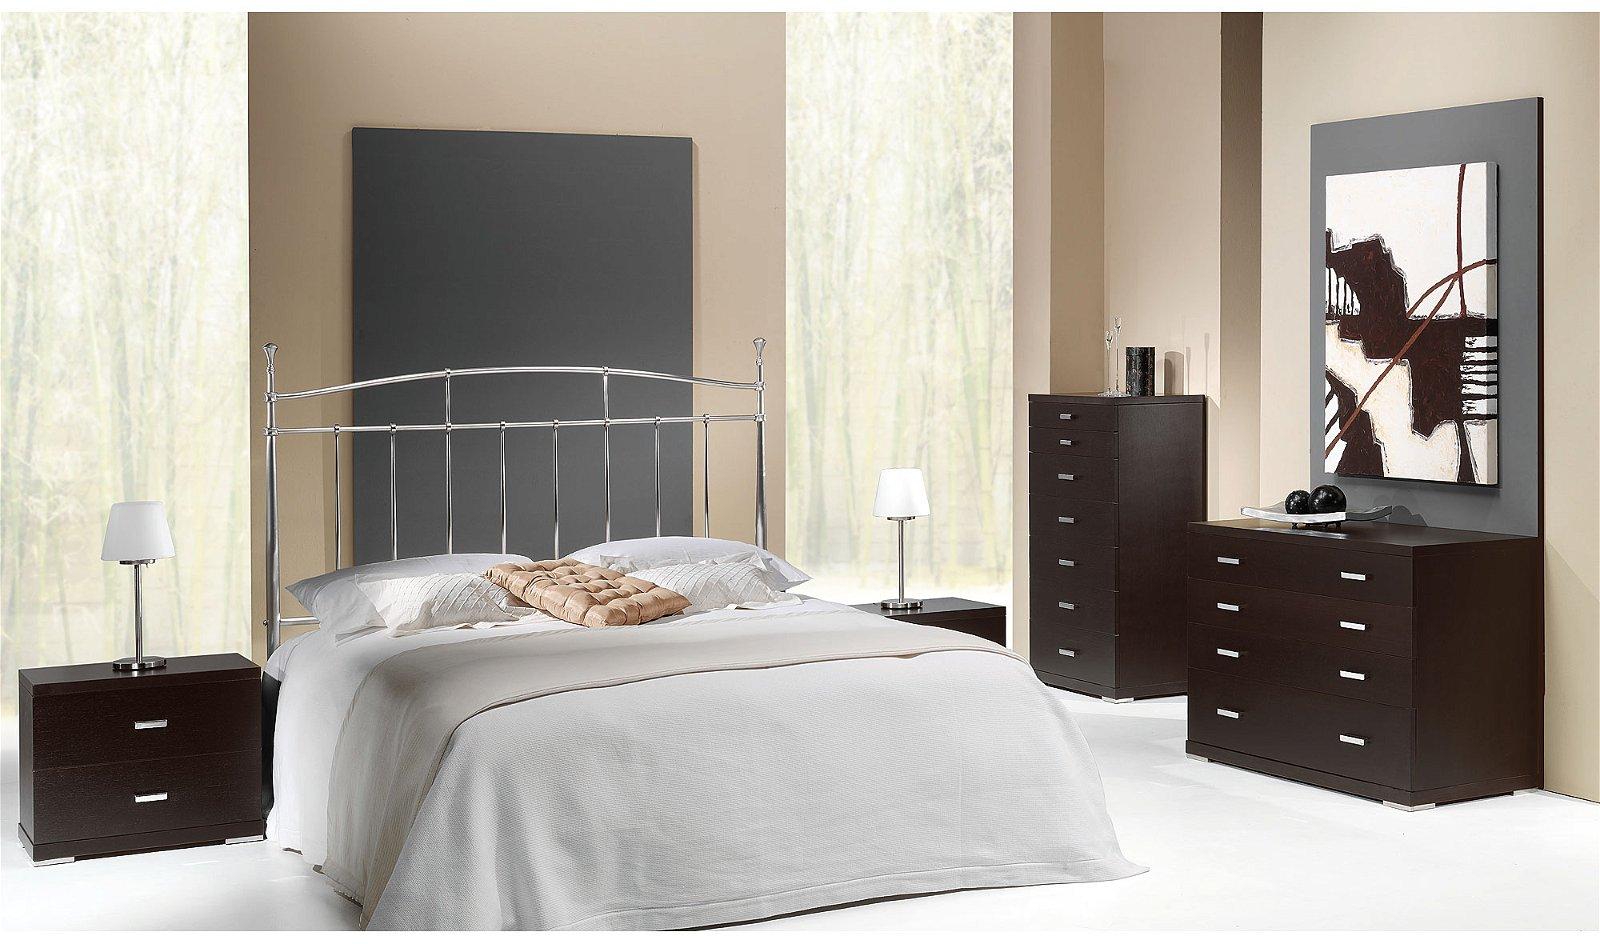 Dormitorio forja Aria